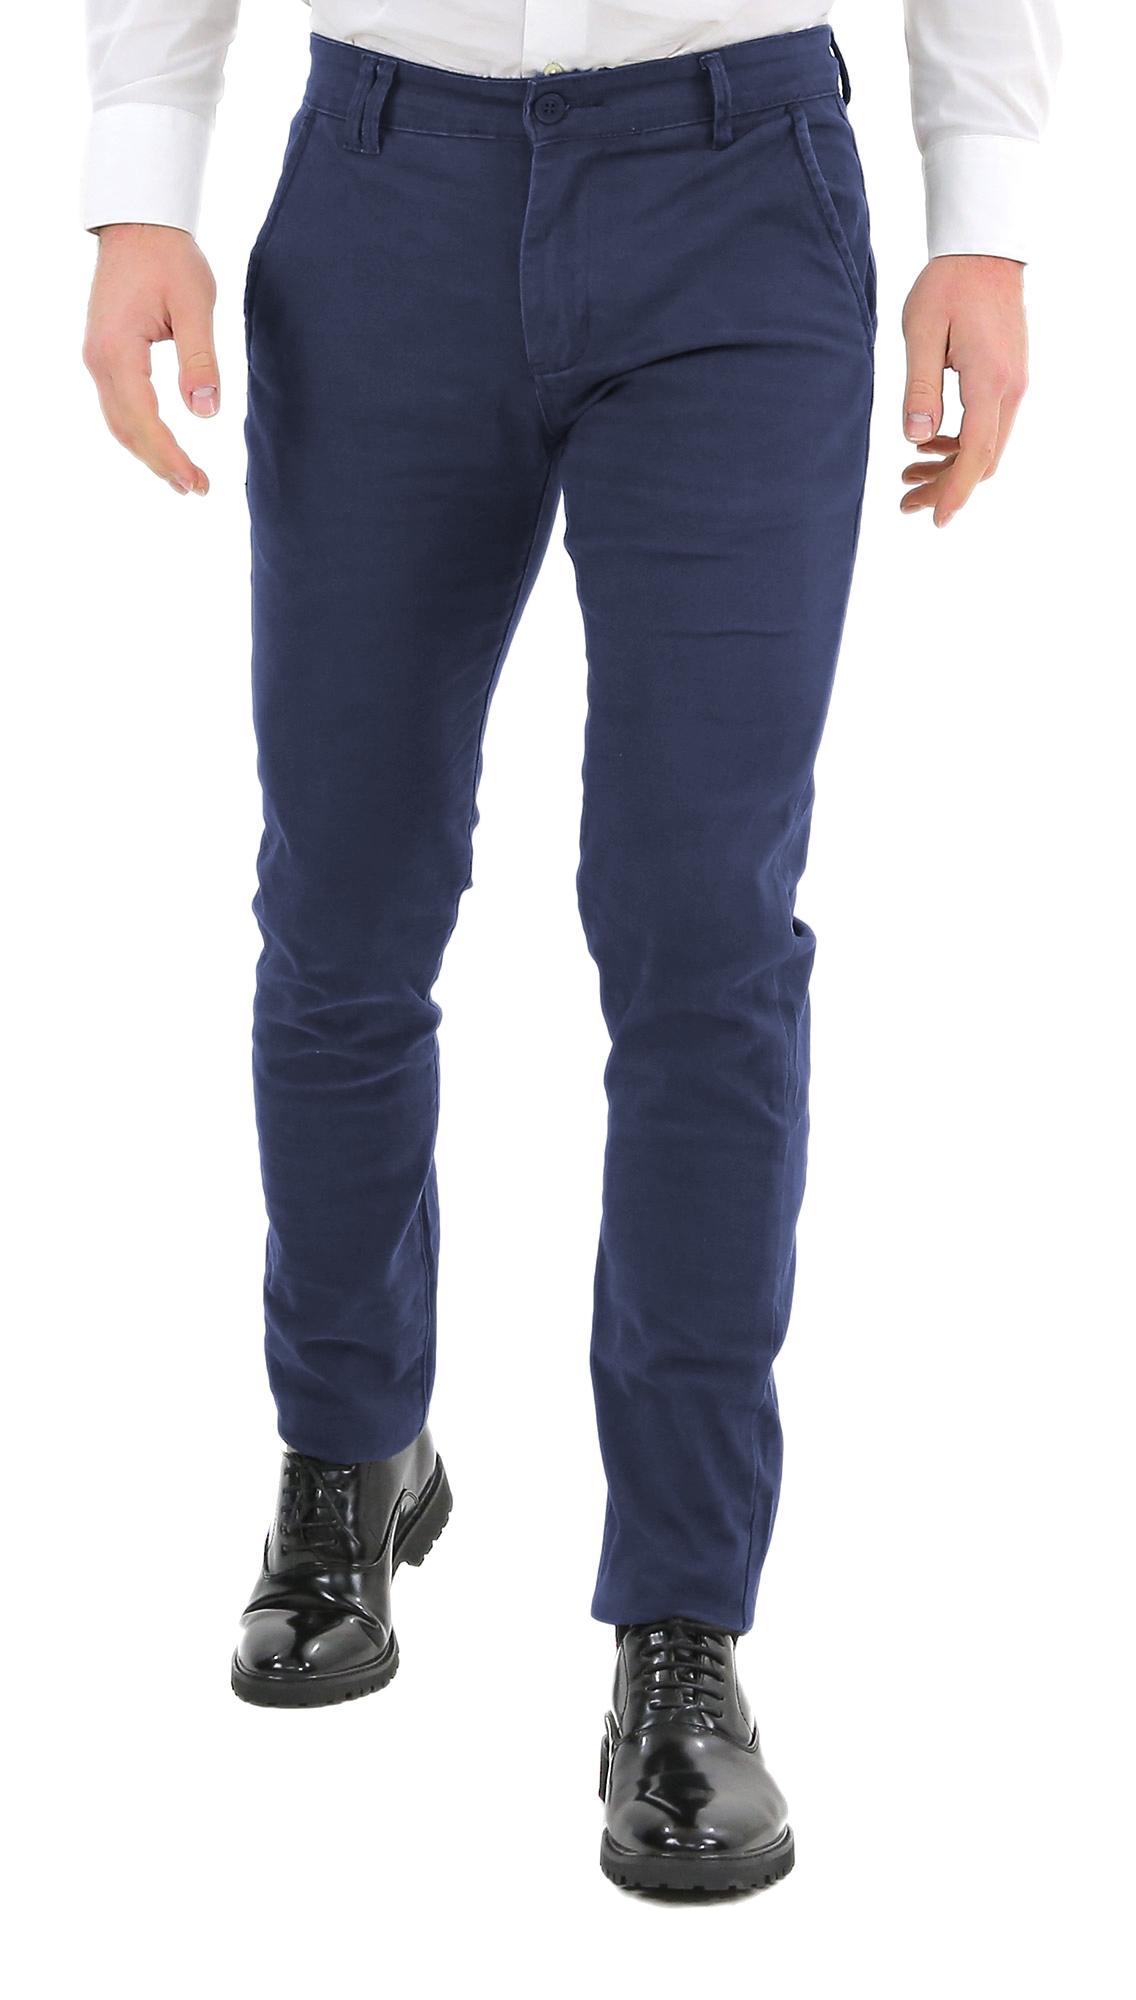 Pantaloni-Uomo-Slim-Fit-Eleganti-Invernali-Blu-Nero-Classico-Chino-Tasca-America miniatura 17